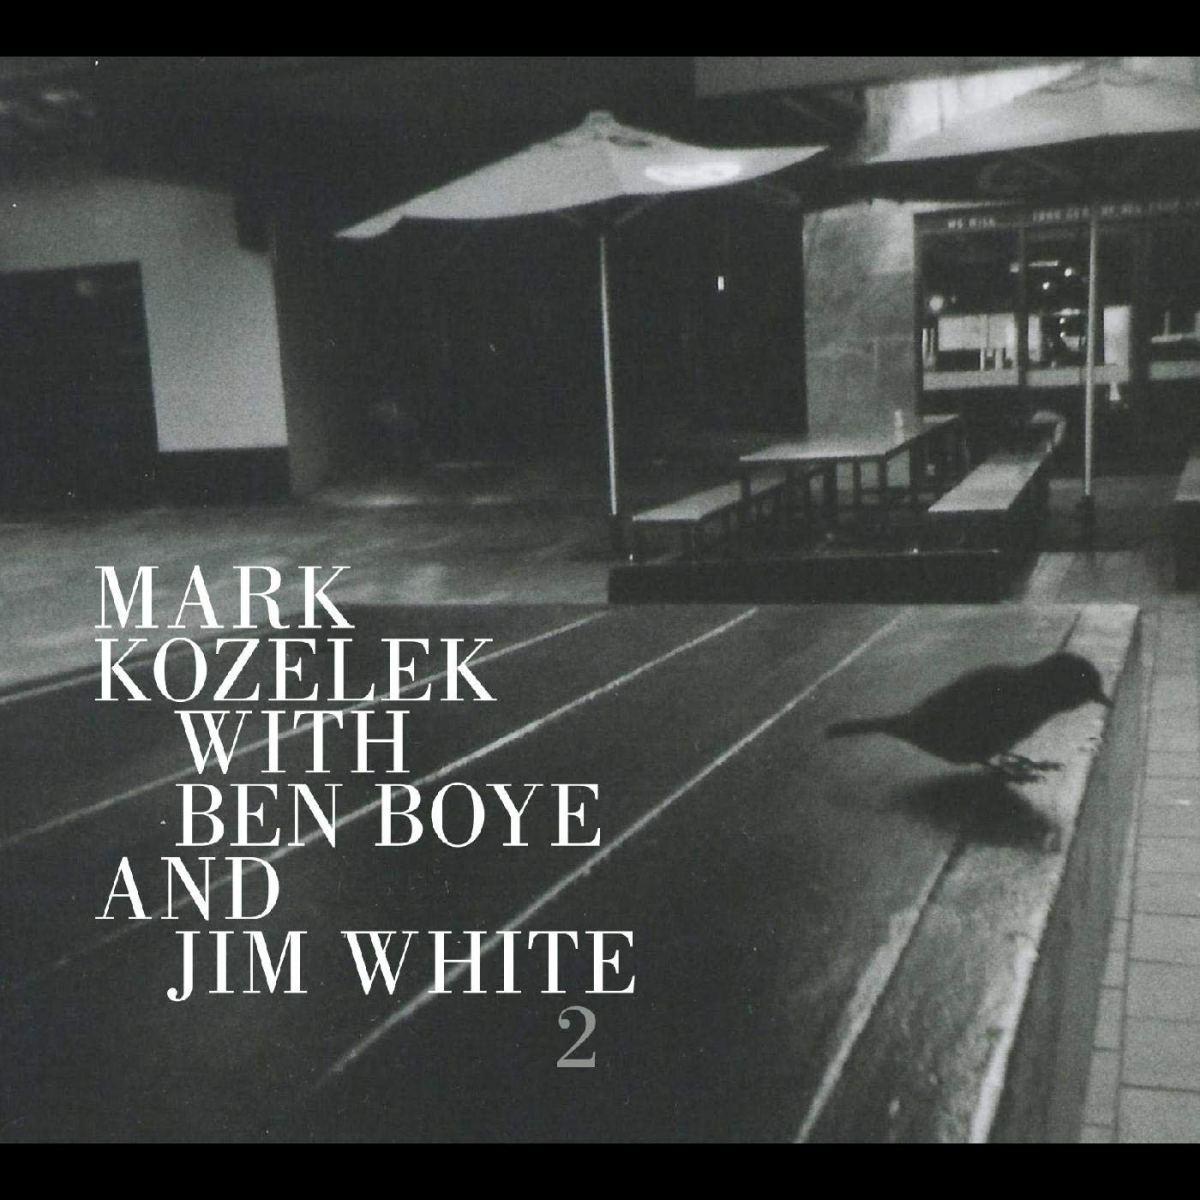 Review: Mark Kozelek with Ben Boye and Jim White2